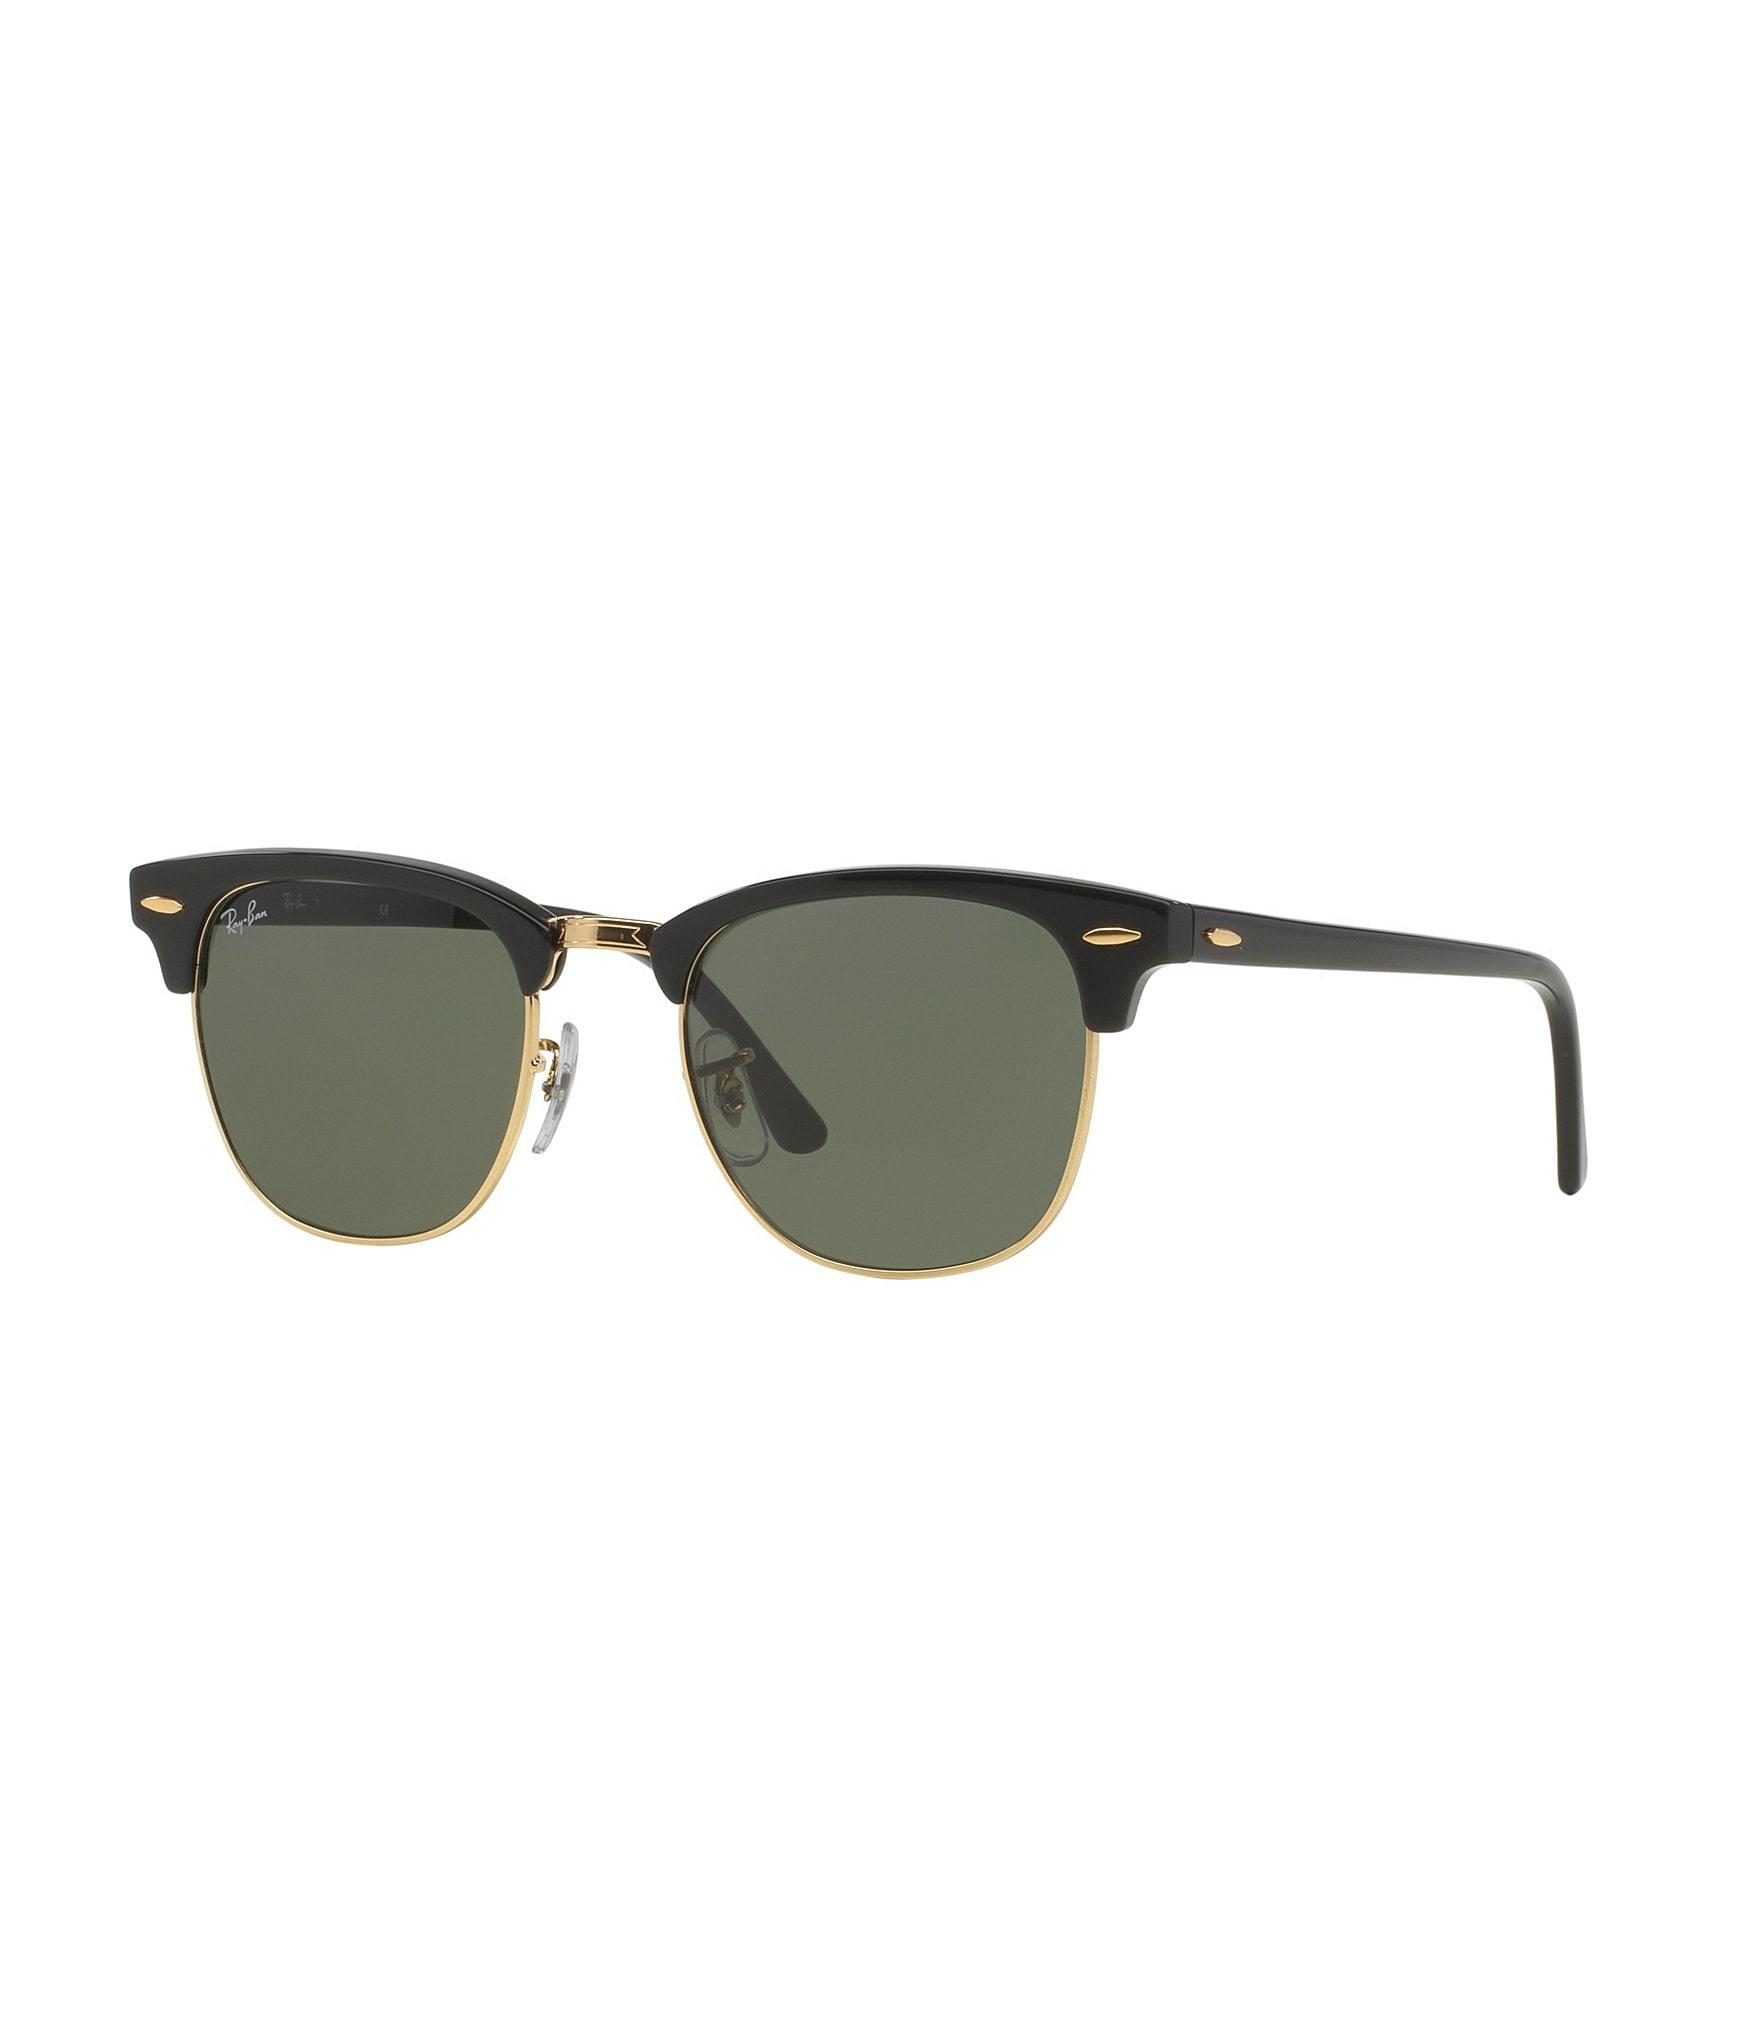 a520b901a610 Ray-Ban Men s Sunglasses   Eyewear